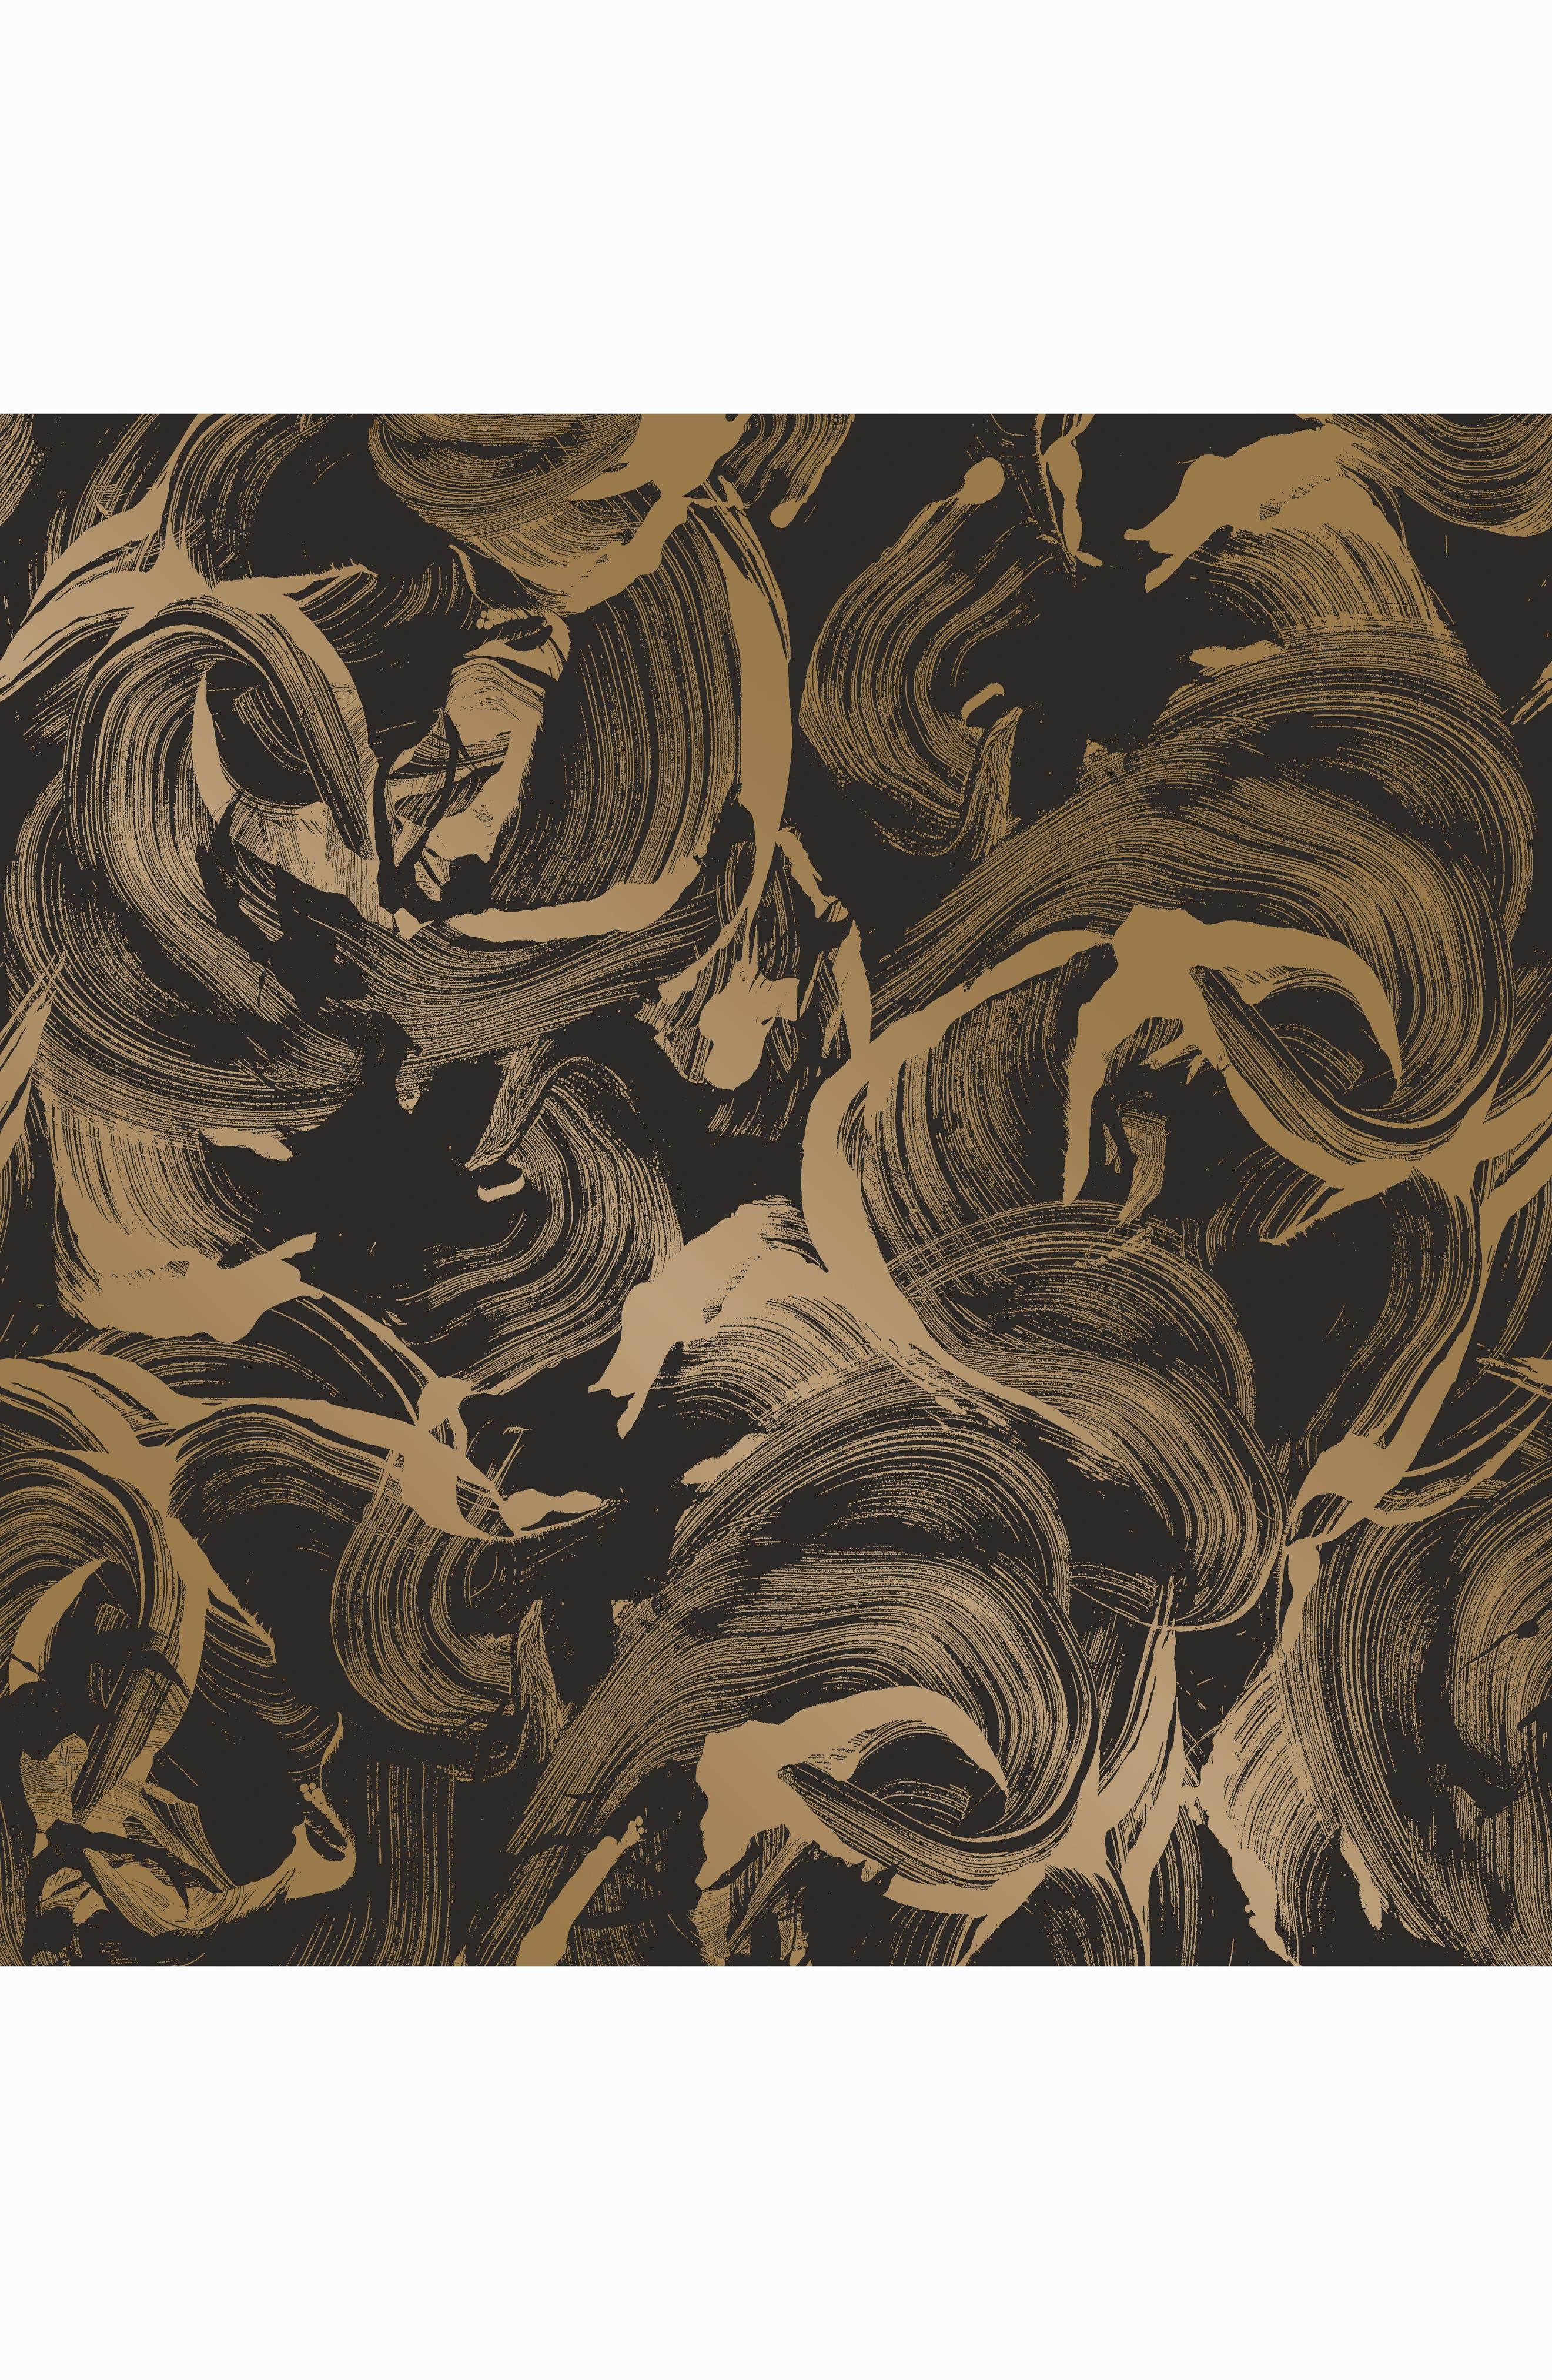 L'Amour Self-Adhesive Vinyl Wallpaper,                         Main,                         color, Black/ Gold